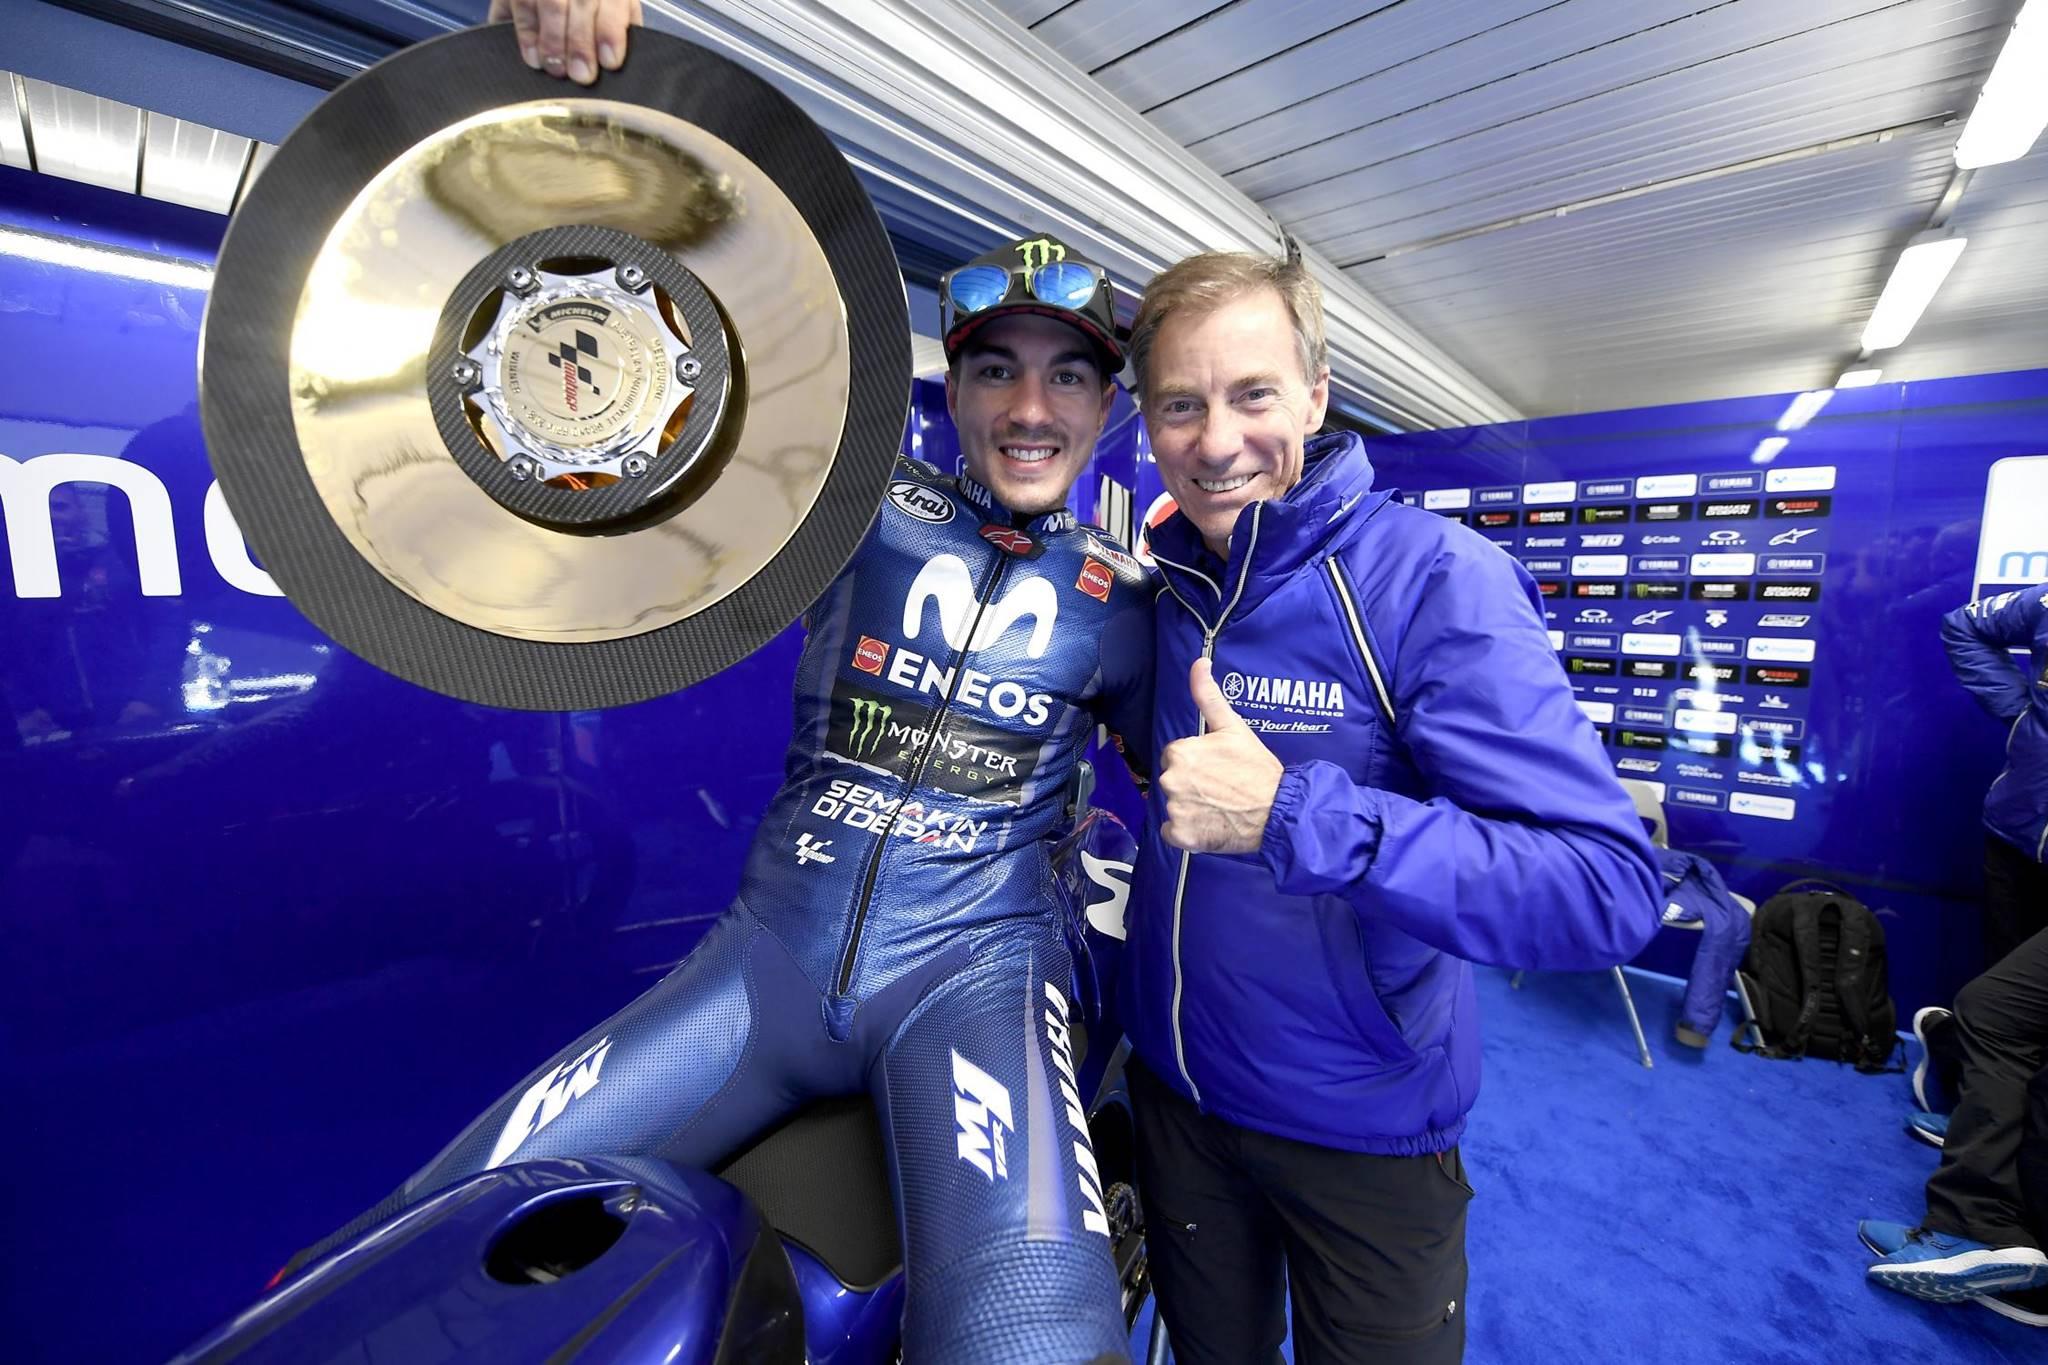 MotoGP_2018_AustralianGP_Xe_Tinhte_013.jpg